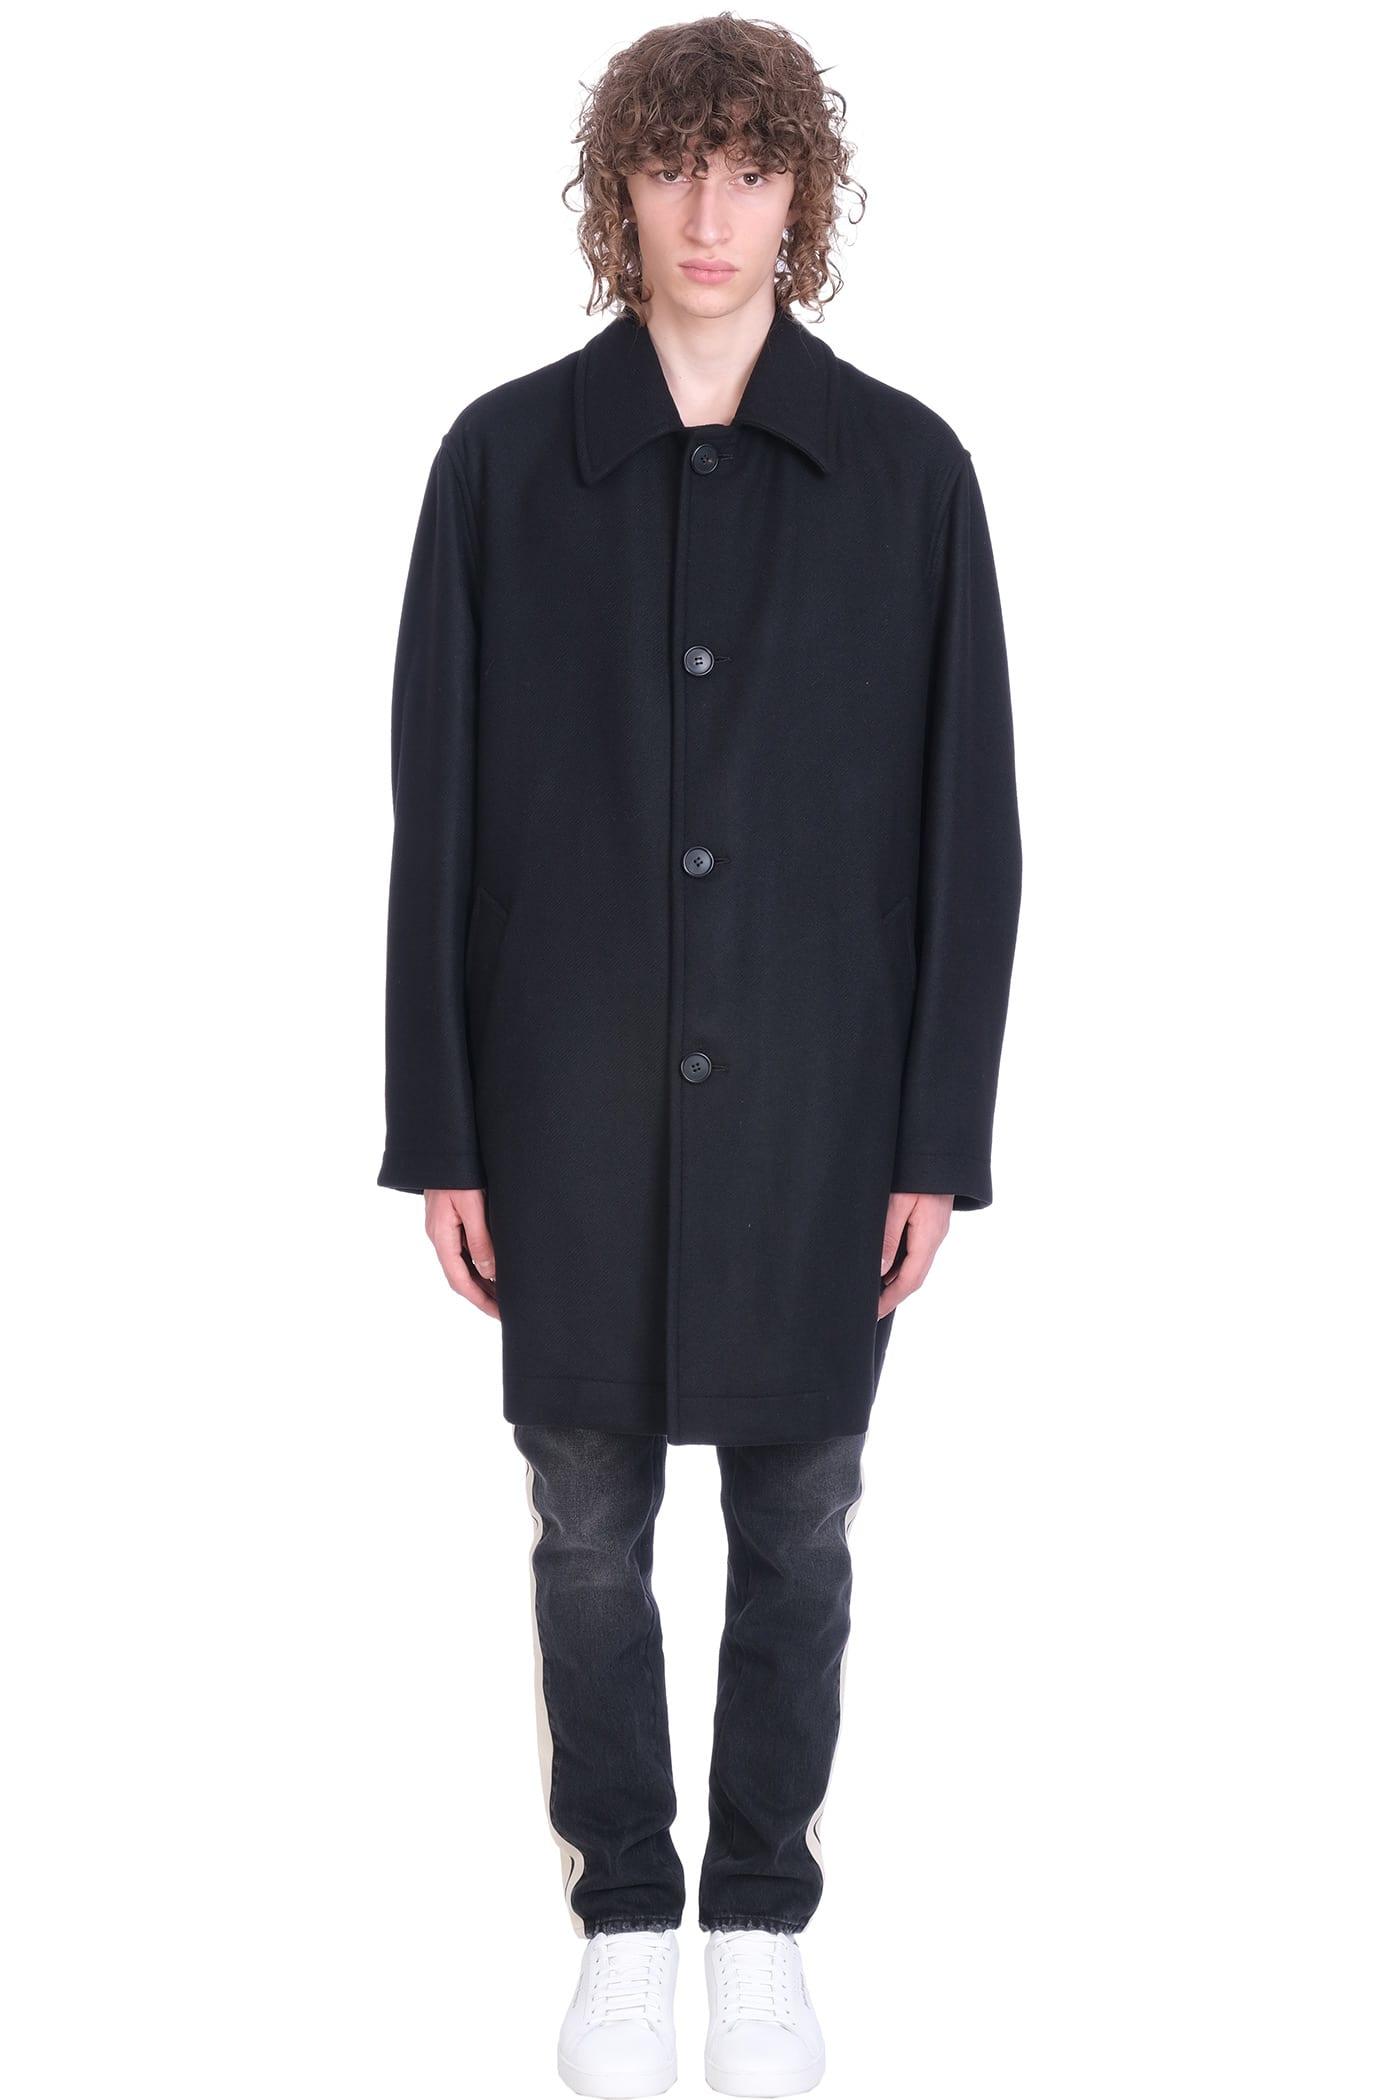 Palm Angels Coat In Black Wool